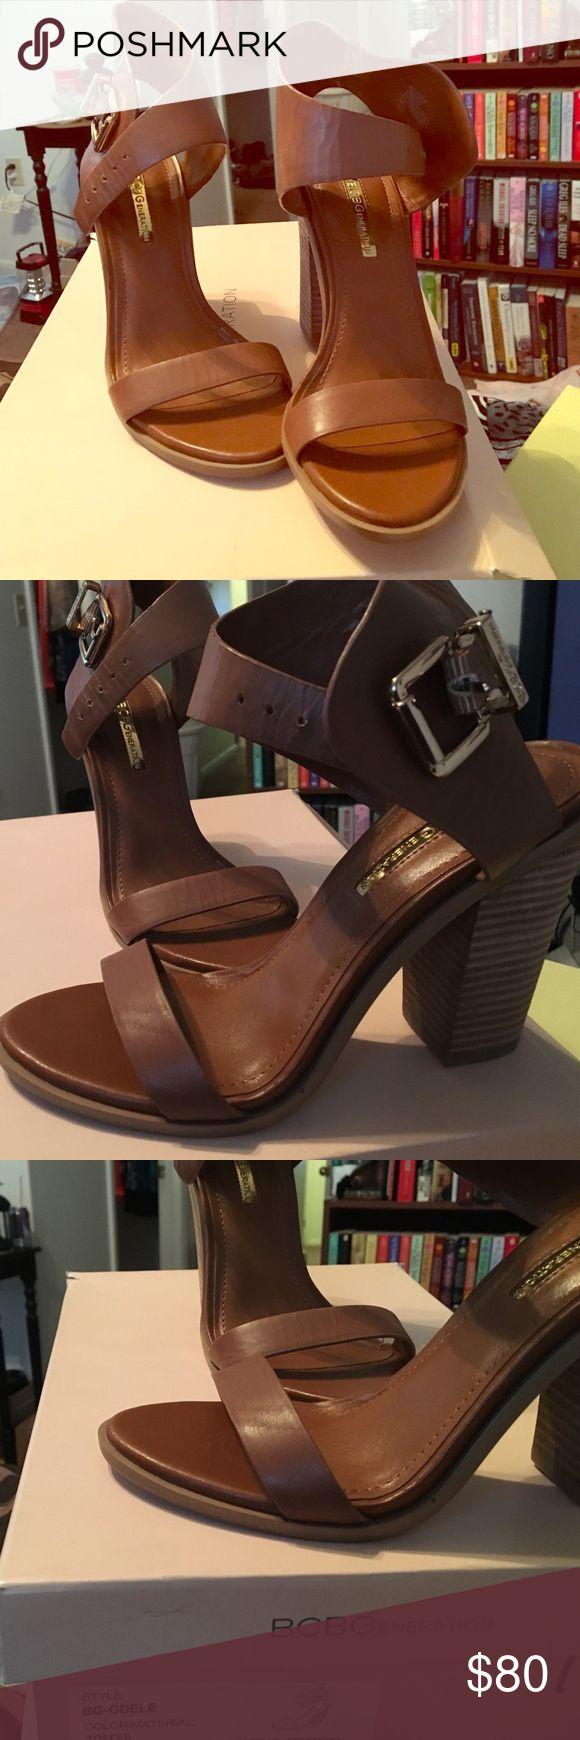 Selling this BCBG Sandal 🚫Exchange ✅counter offer. on Poshmark! My username is: oheneba. #shopmycloset #poshmark #fashion #shopping #style #forsale #BCBGeneration #Shoes